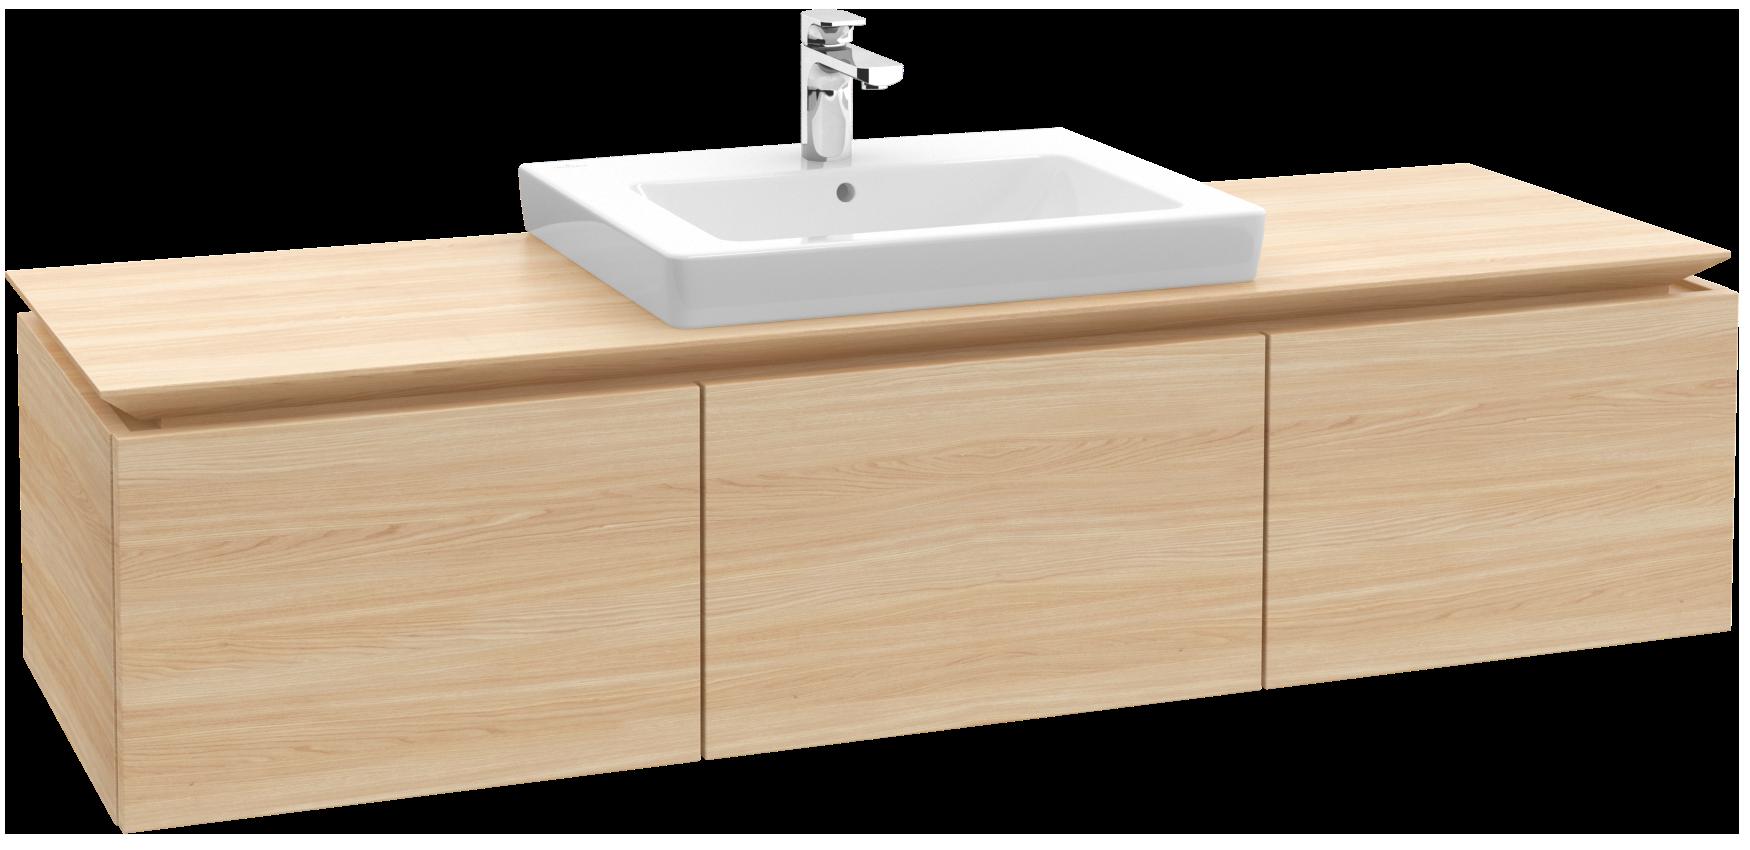 Legato meuble sous lavabo b25100 villeroy boch for Meuble sous lavabo fly